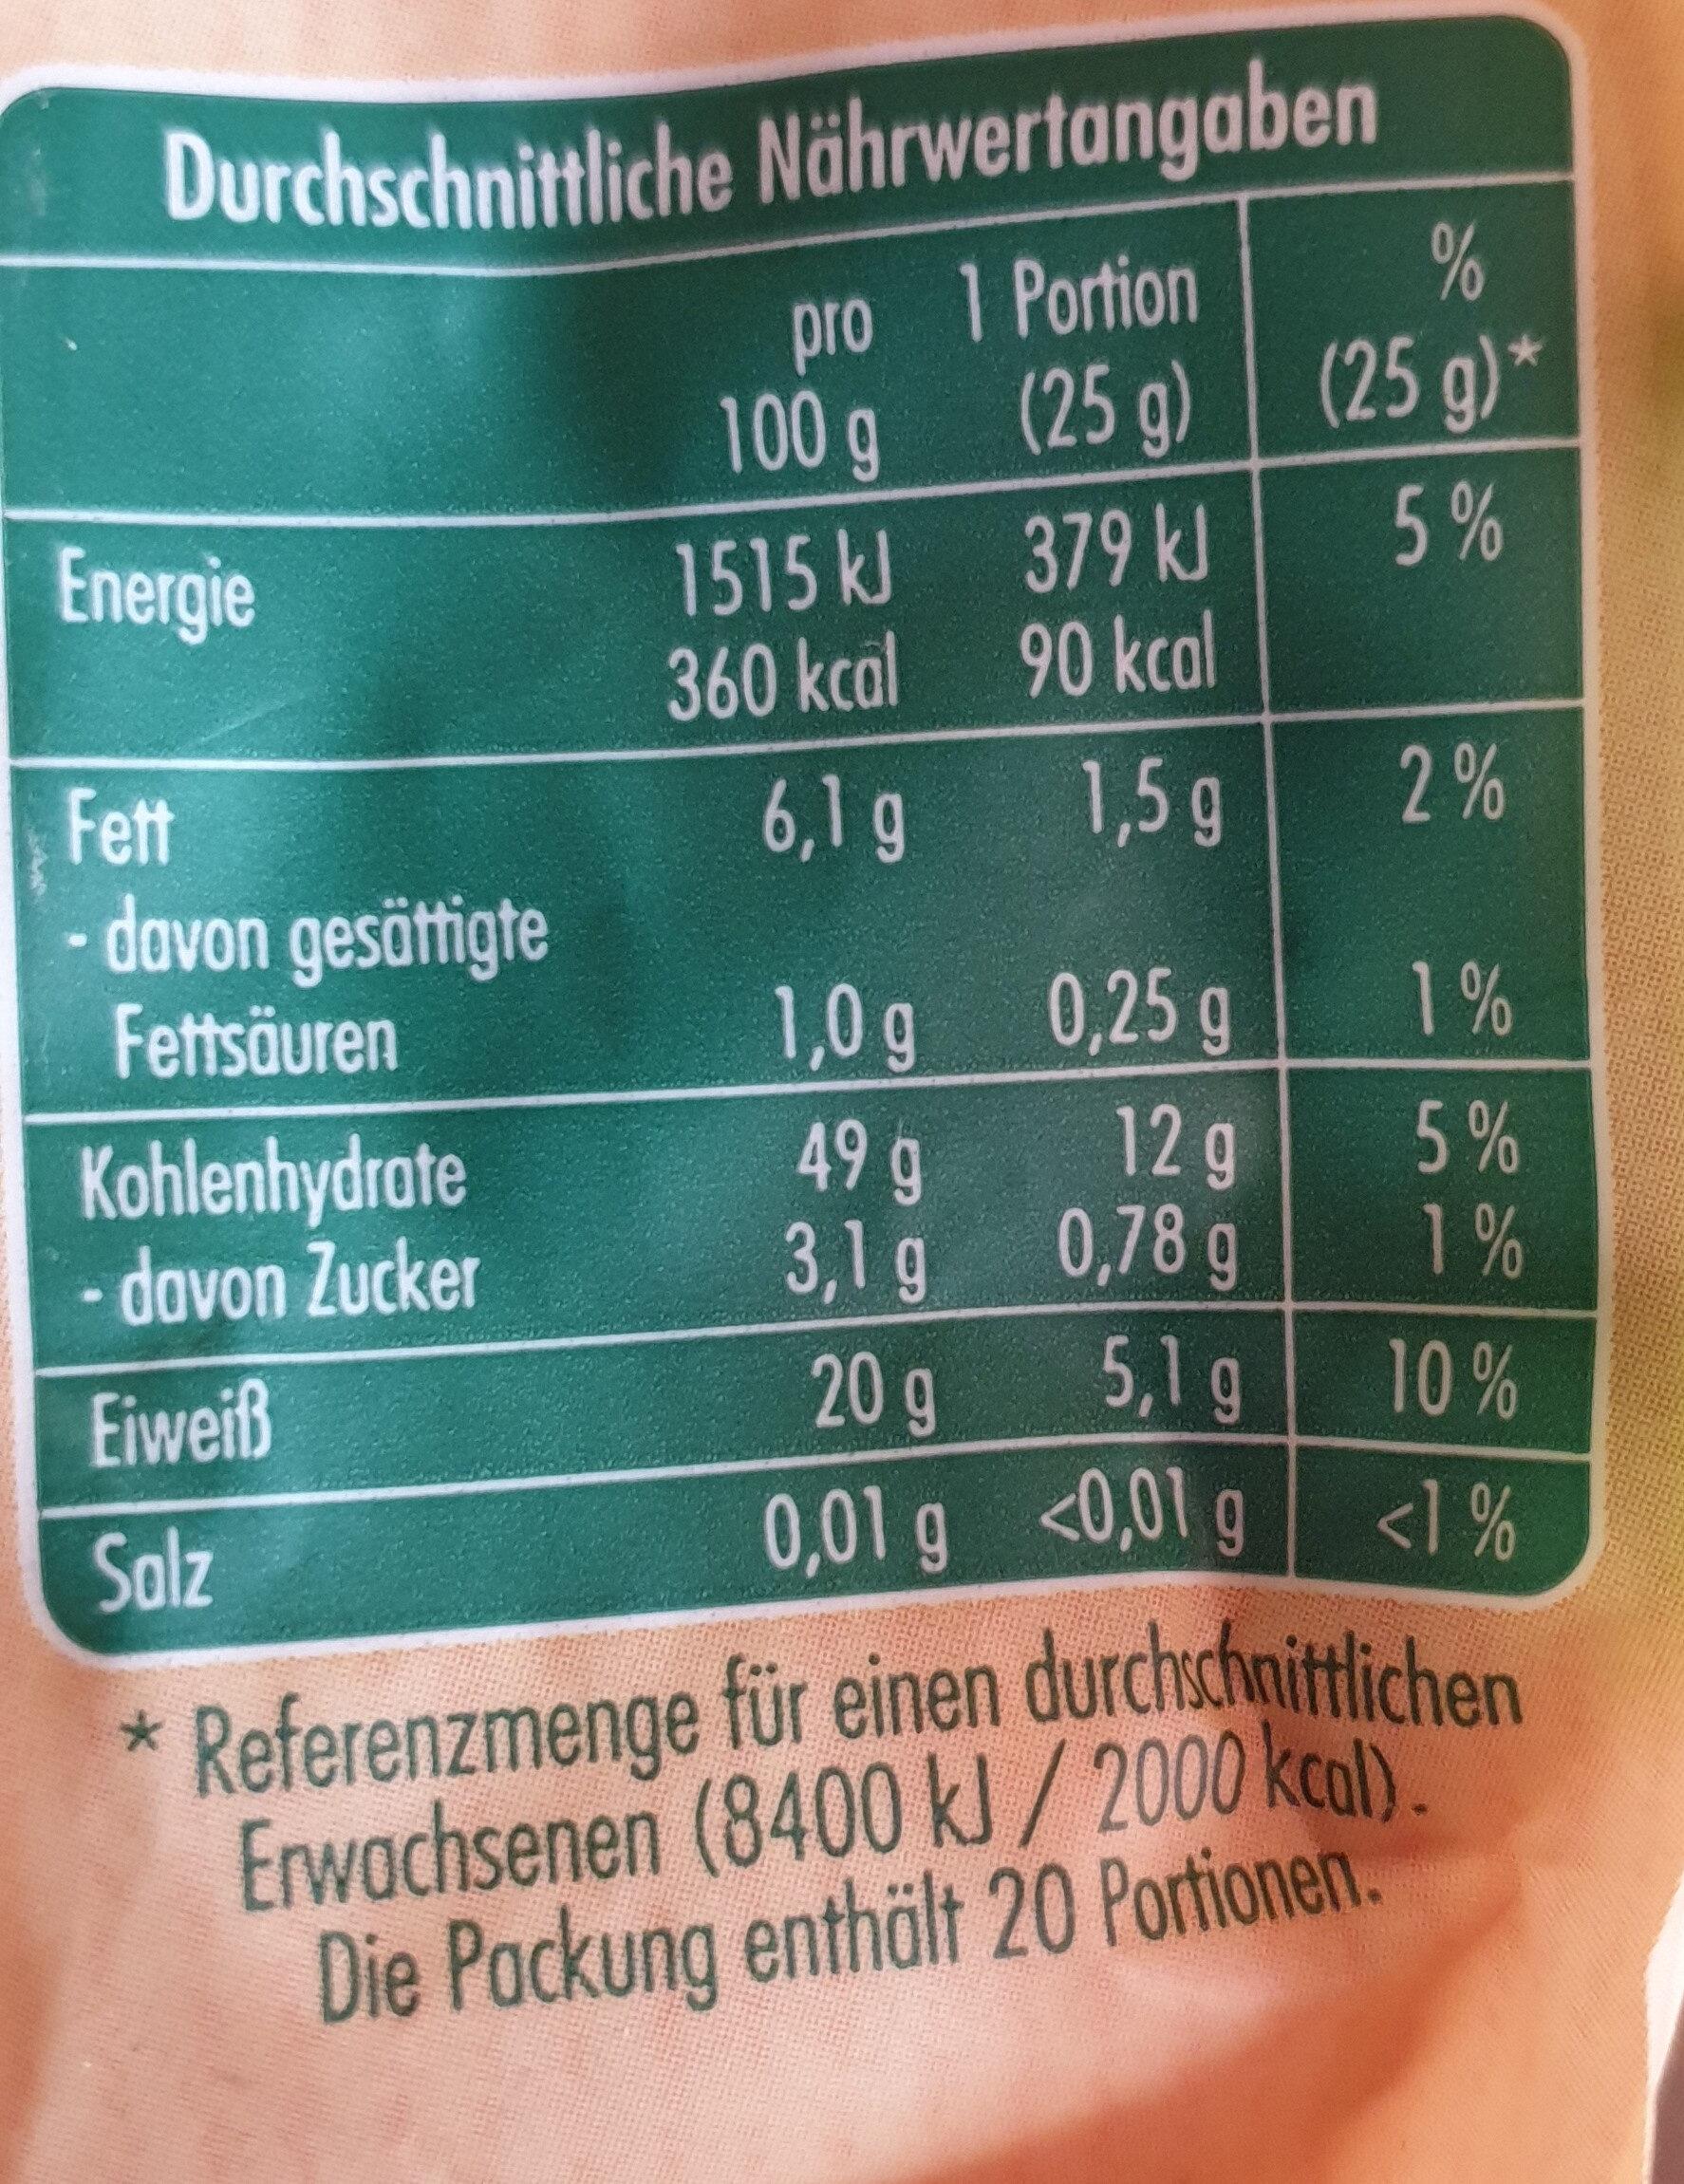 Kichererbsen Getrocknet / Pois chiches secs - Nutrition facts - de